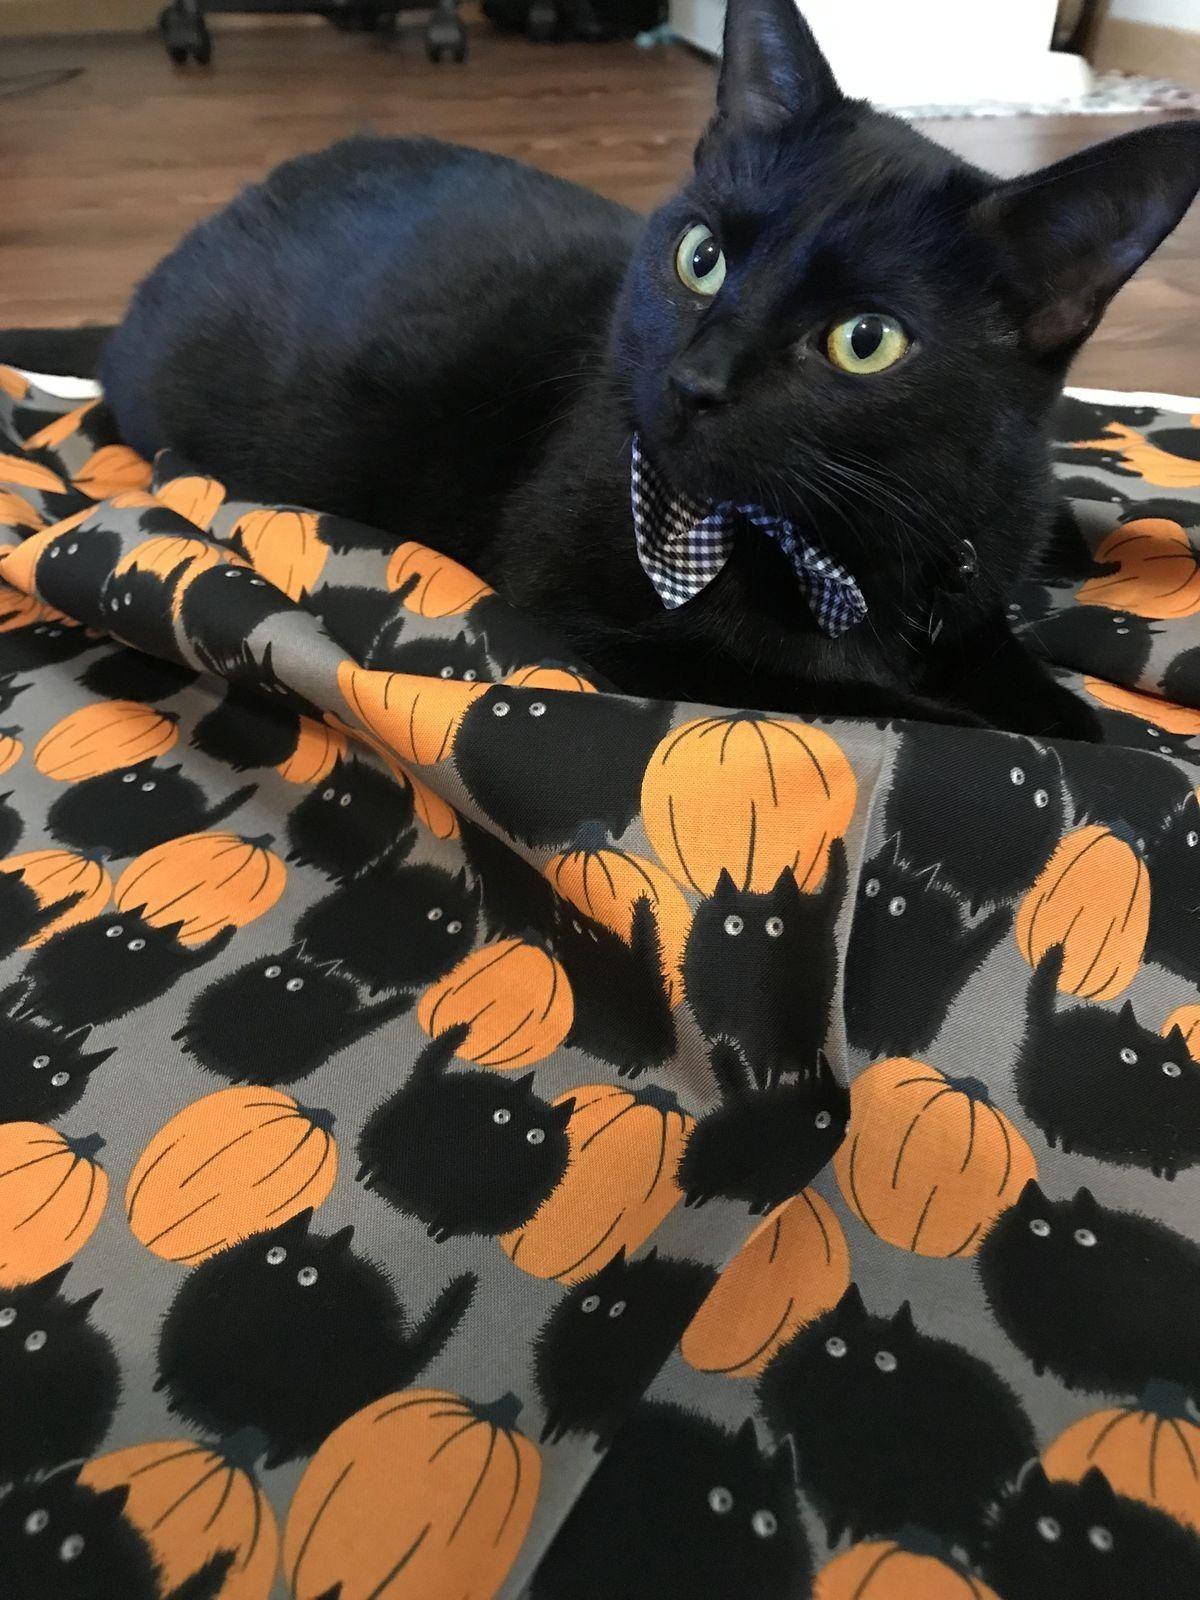 Pin by Jo =^,^= Allen on _Halloween & Fall Cats